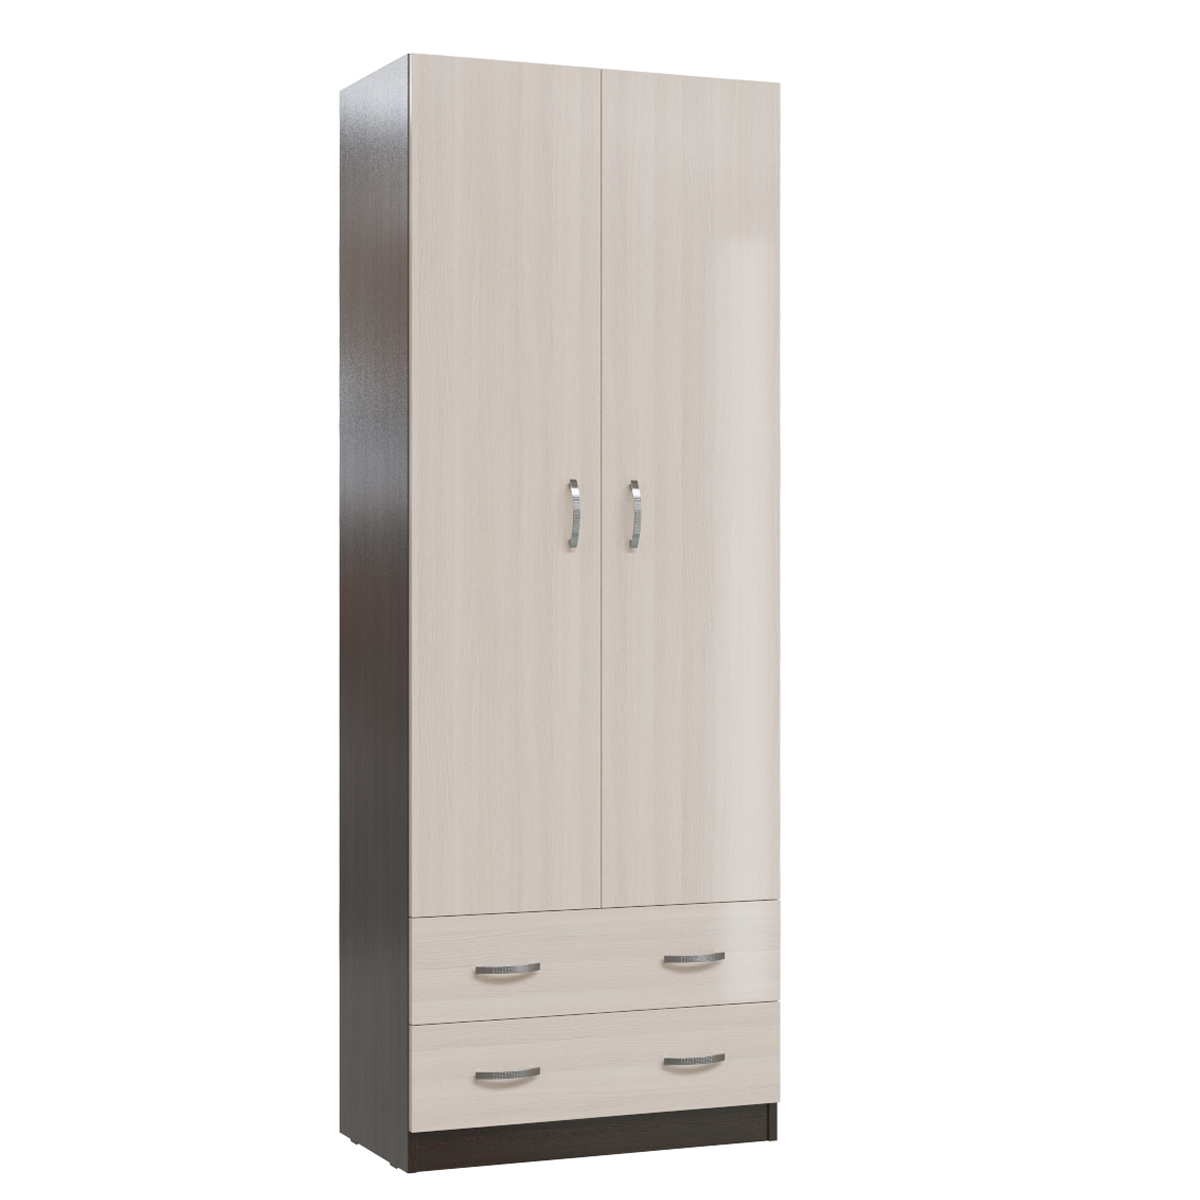 Шкаф с ящиками Мэри-Мебель Мэри МК-3 дуб молочный/дуб венге, 70х40х190 см